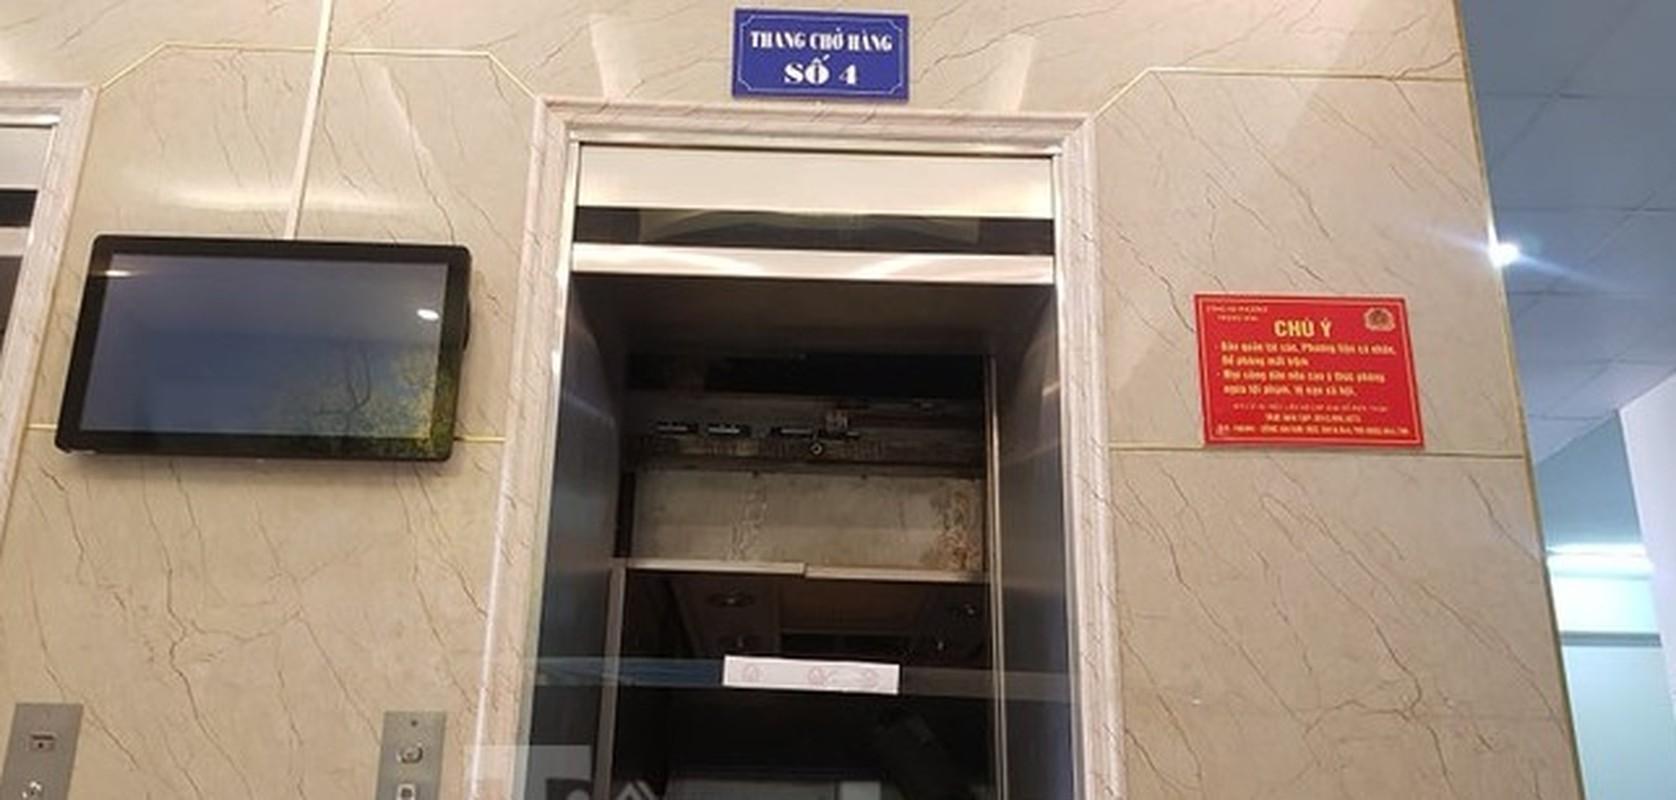 Hien truong vu roi thang may khien nhieu nguoi bi thuong o Ha Noi-Hinh-3